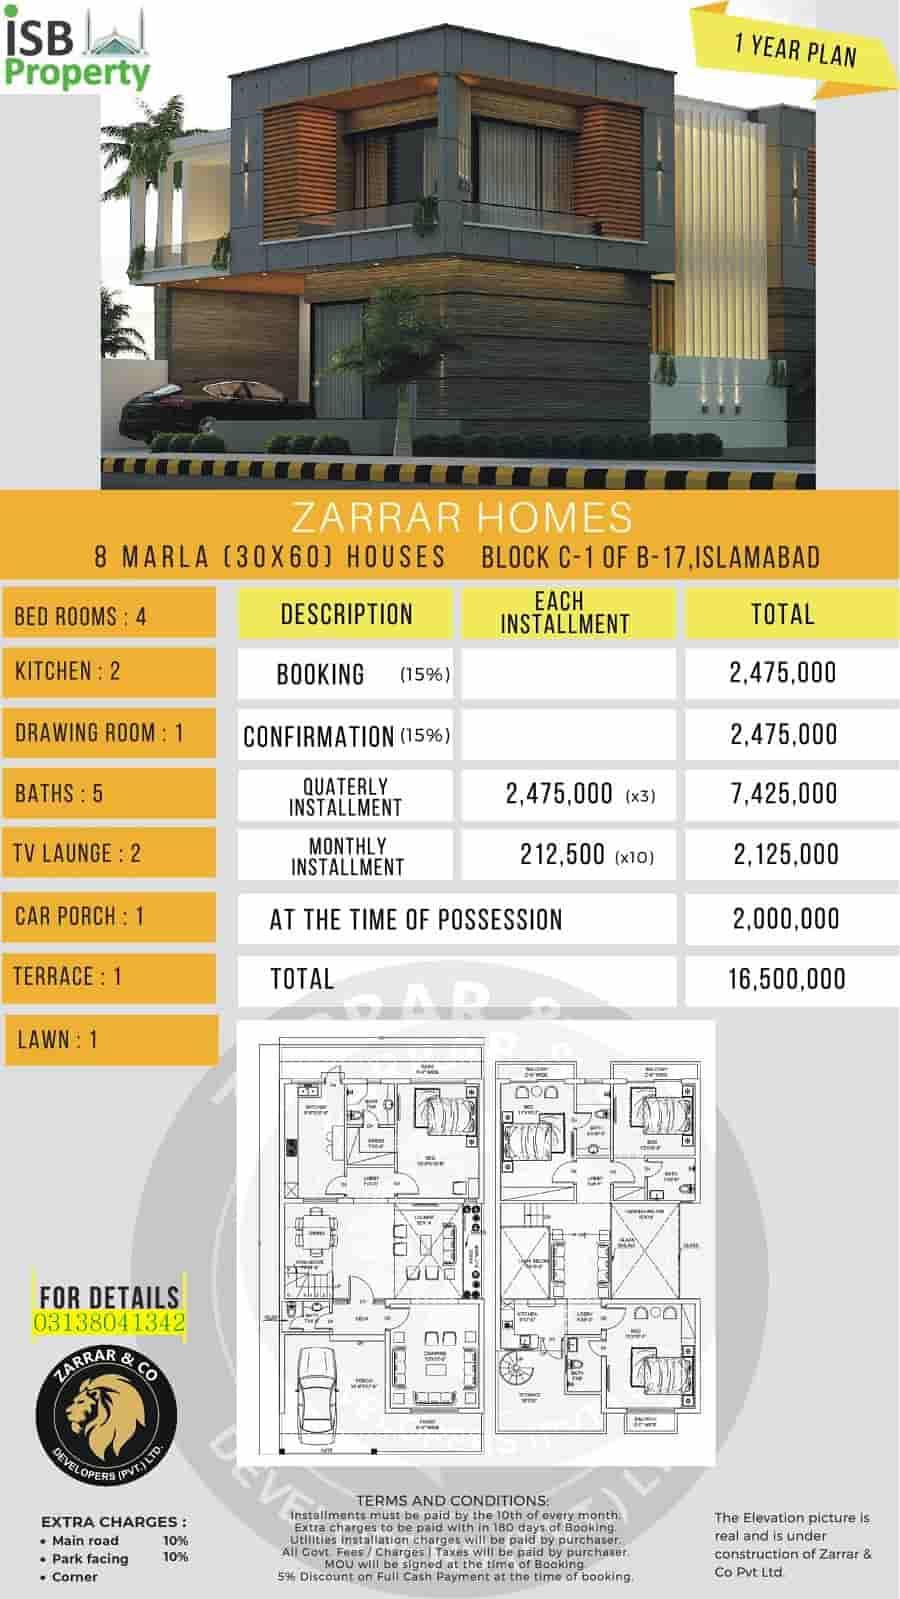 Zarar Homes 8 Marla 1 Year Plan 1